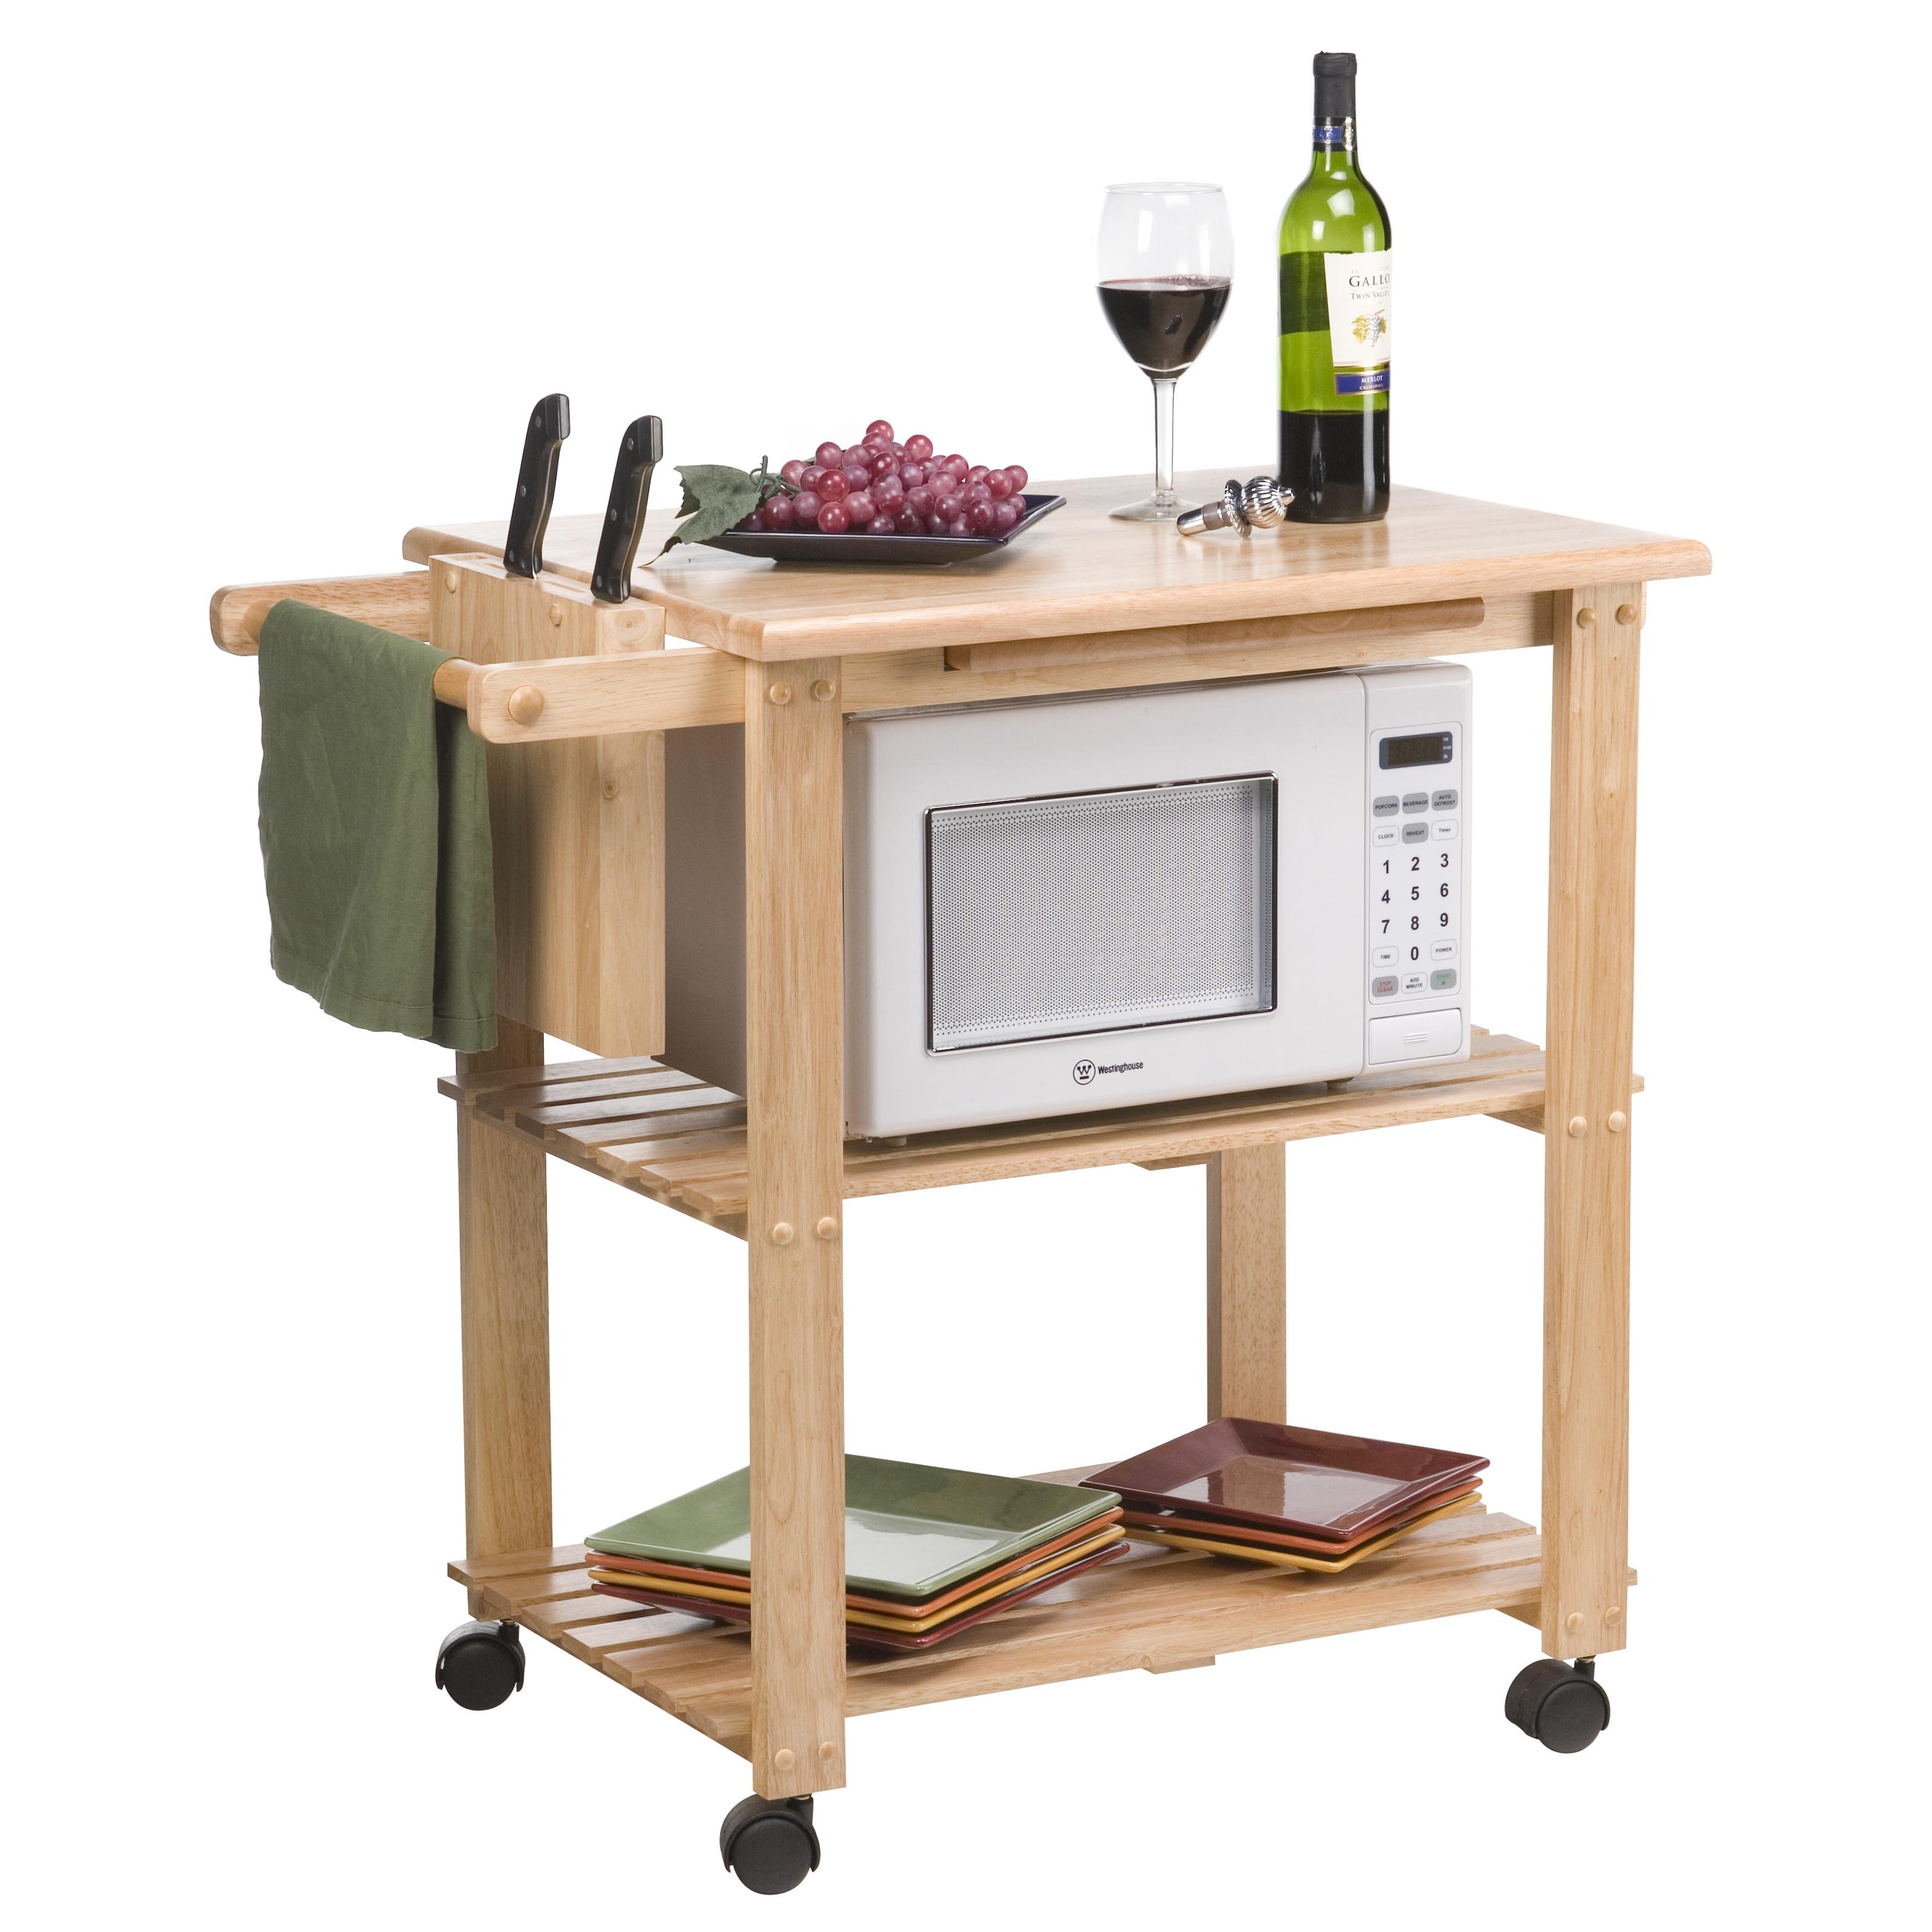 Making Microwave Cart